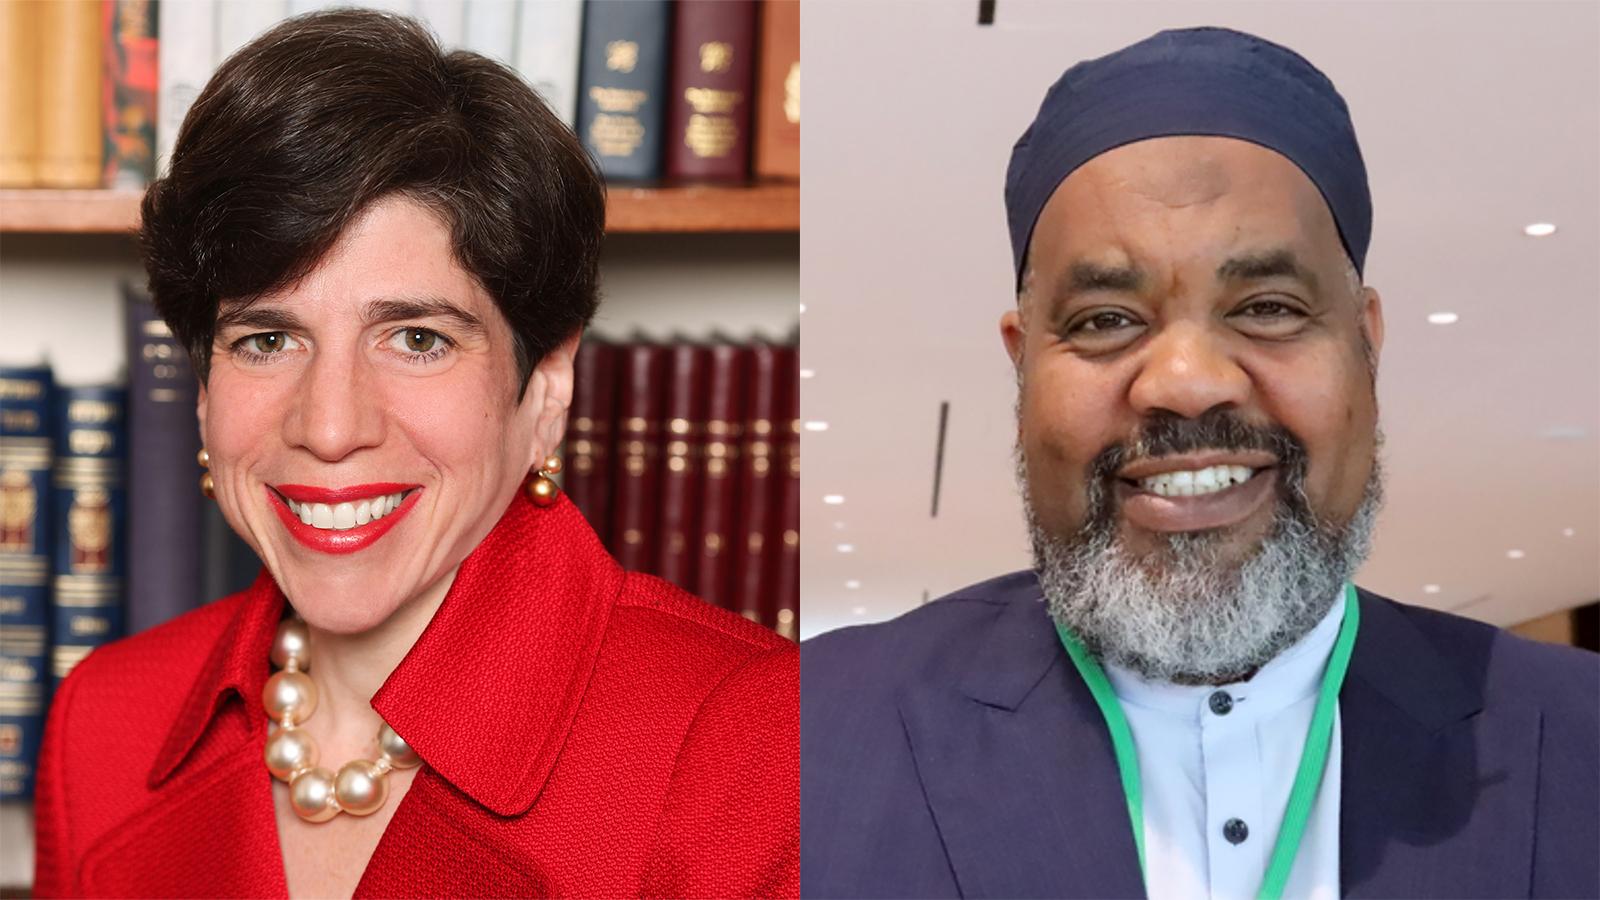 Rabbi Julie Schonfeld, left, and Imam Mohamed Magid. Courtesy photo, left. RNS photo by Adelle M. Banks, right.